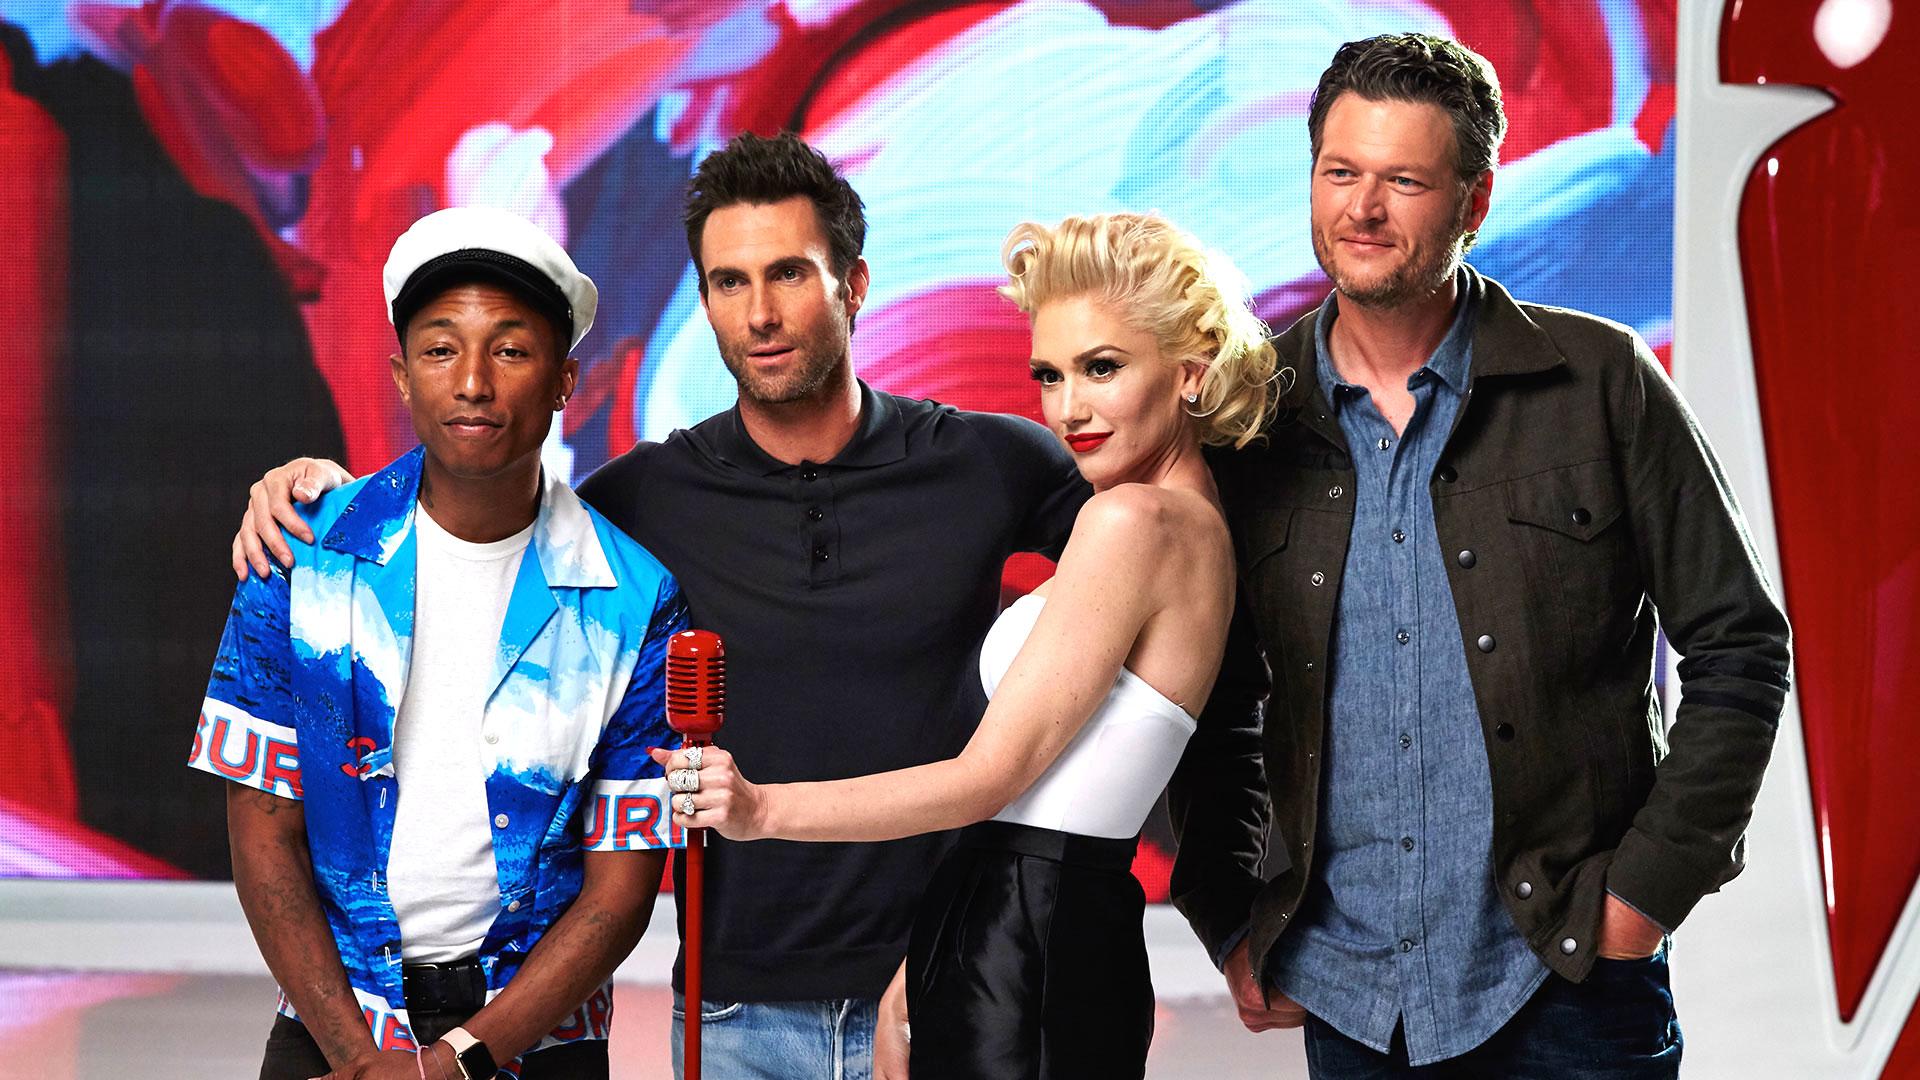 'The Voice' Season 9 Judges Revealed